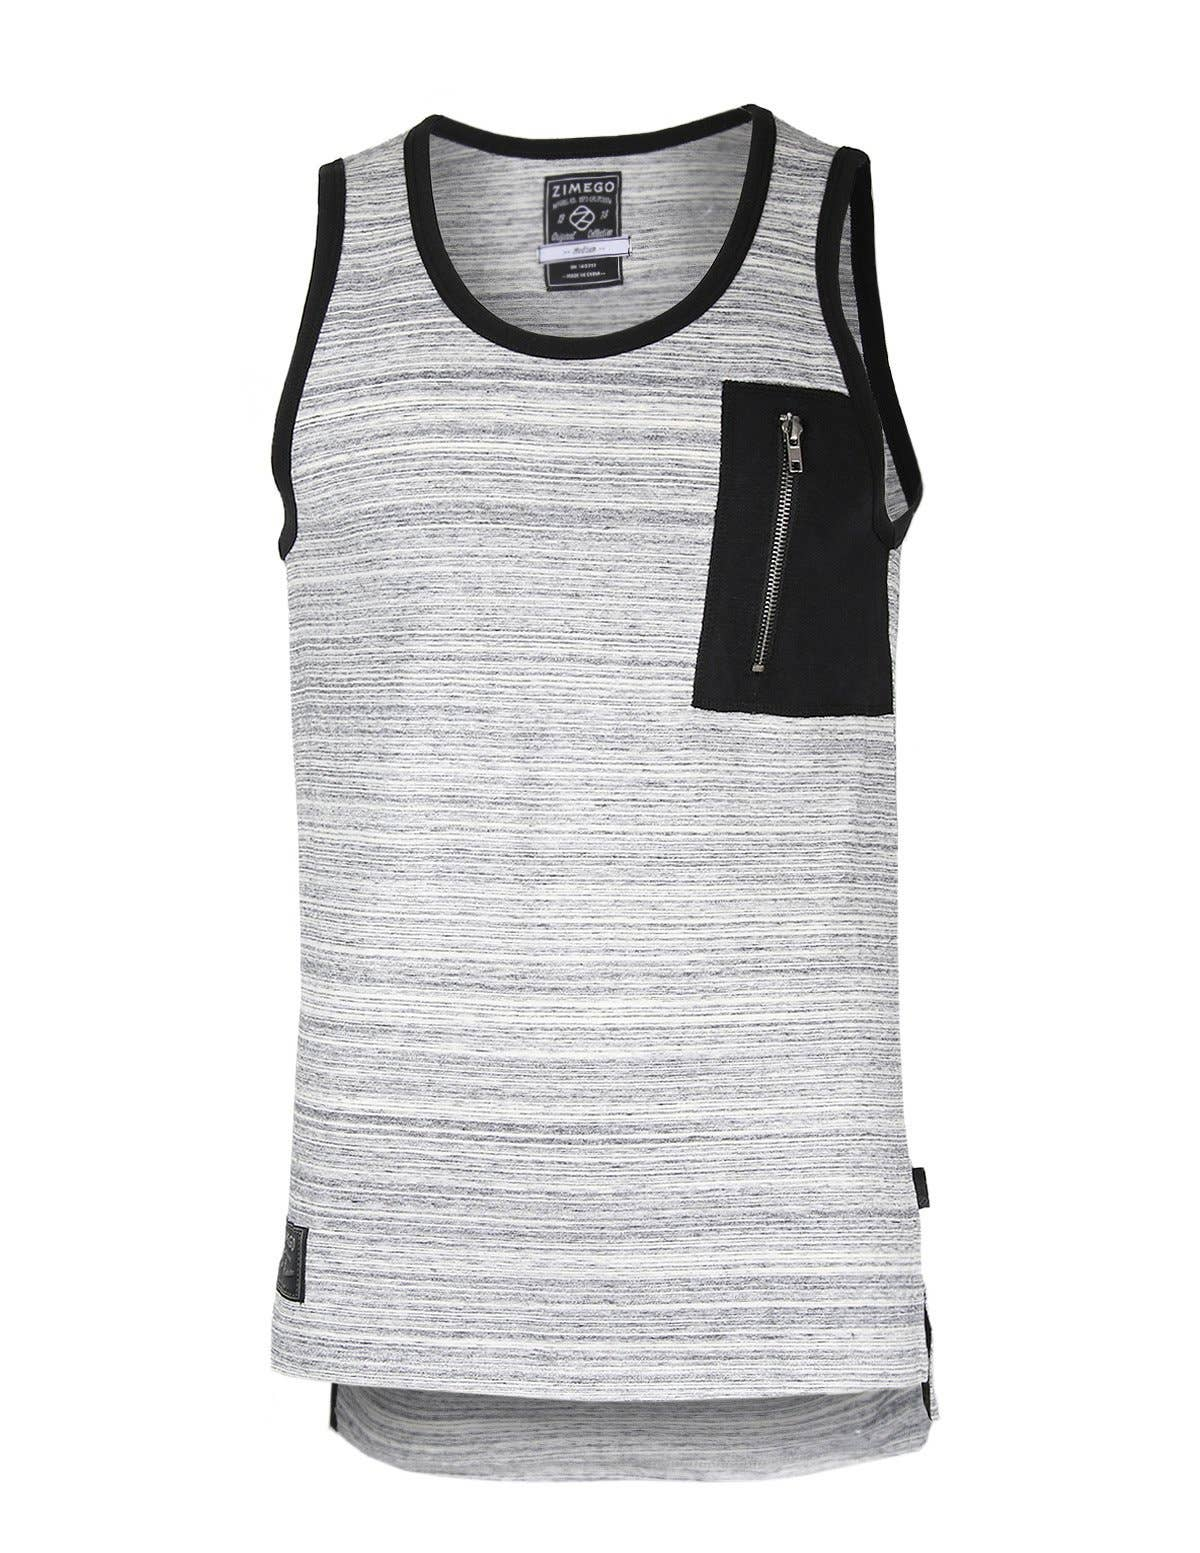 Scrub Life Nurse Men Printed Vest Sports Tank-Top Shirts Leisure Tee Sleeveless Shirts